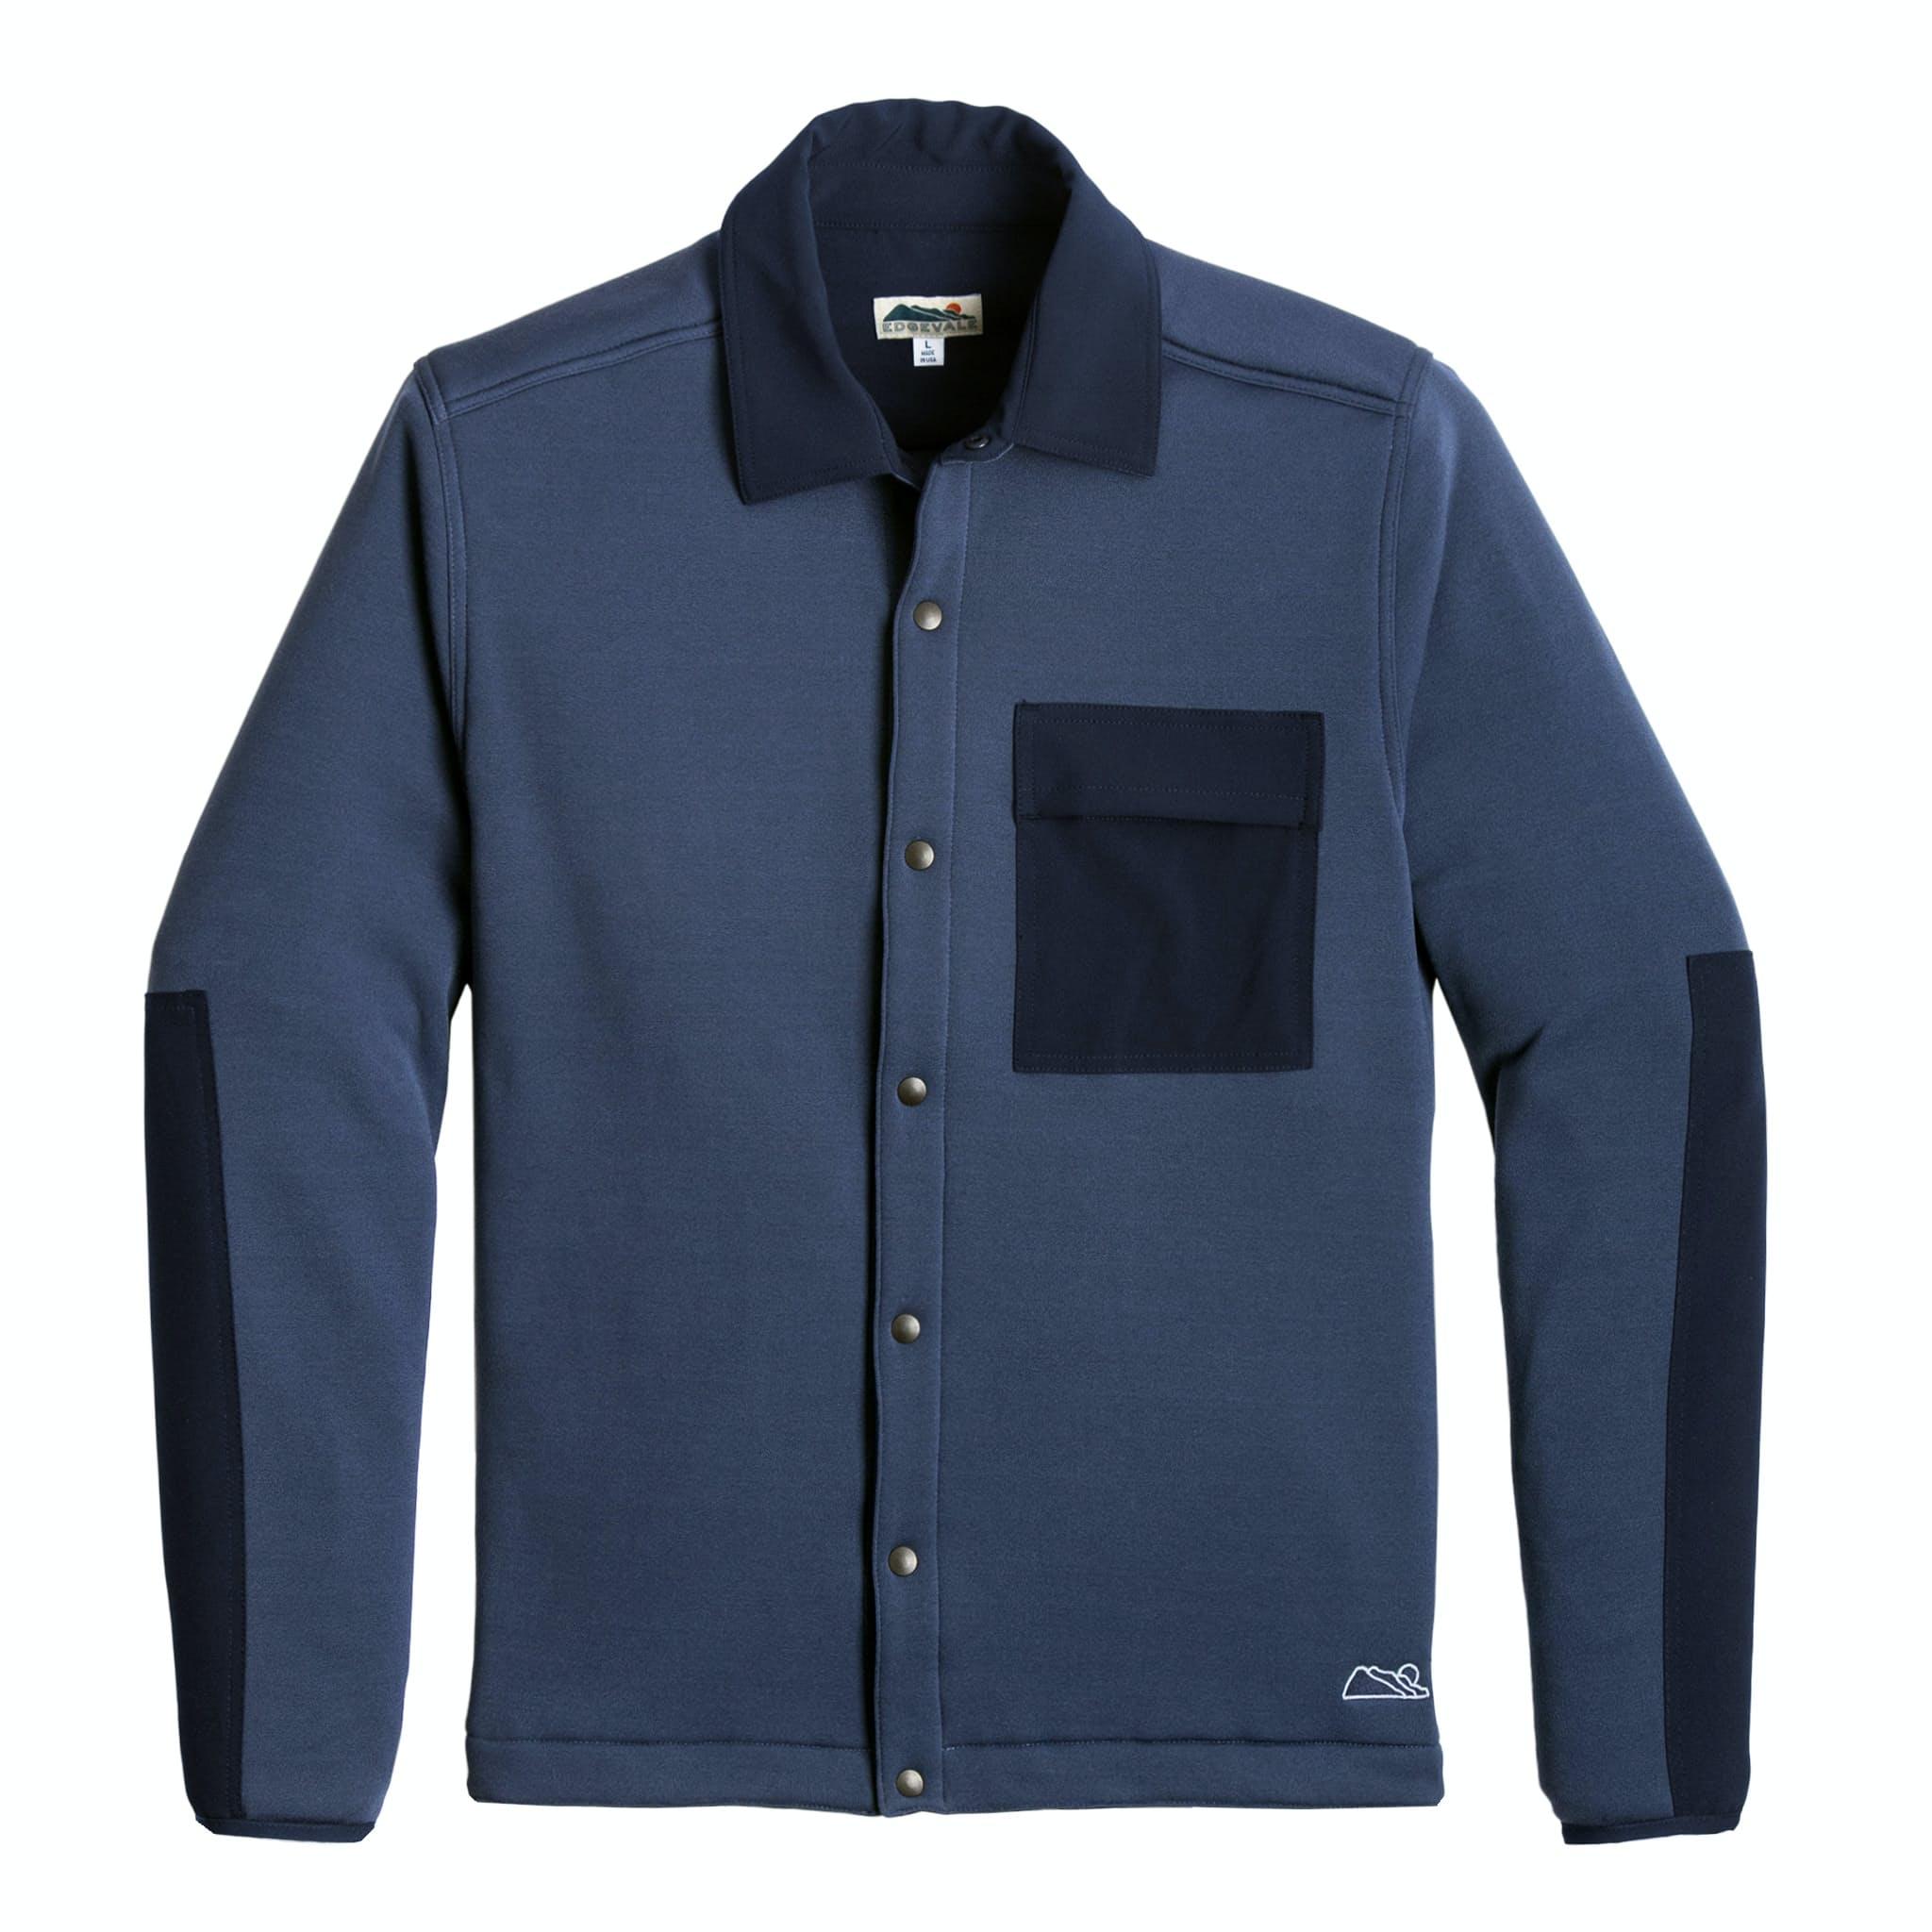 0pzjyjveio edgevale merritt jacket 0 original